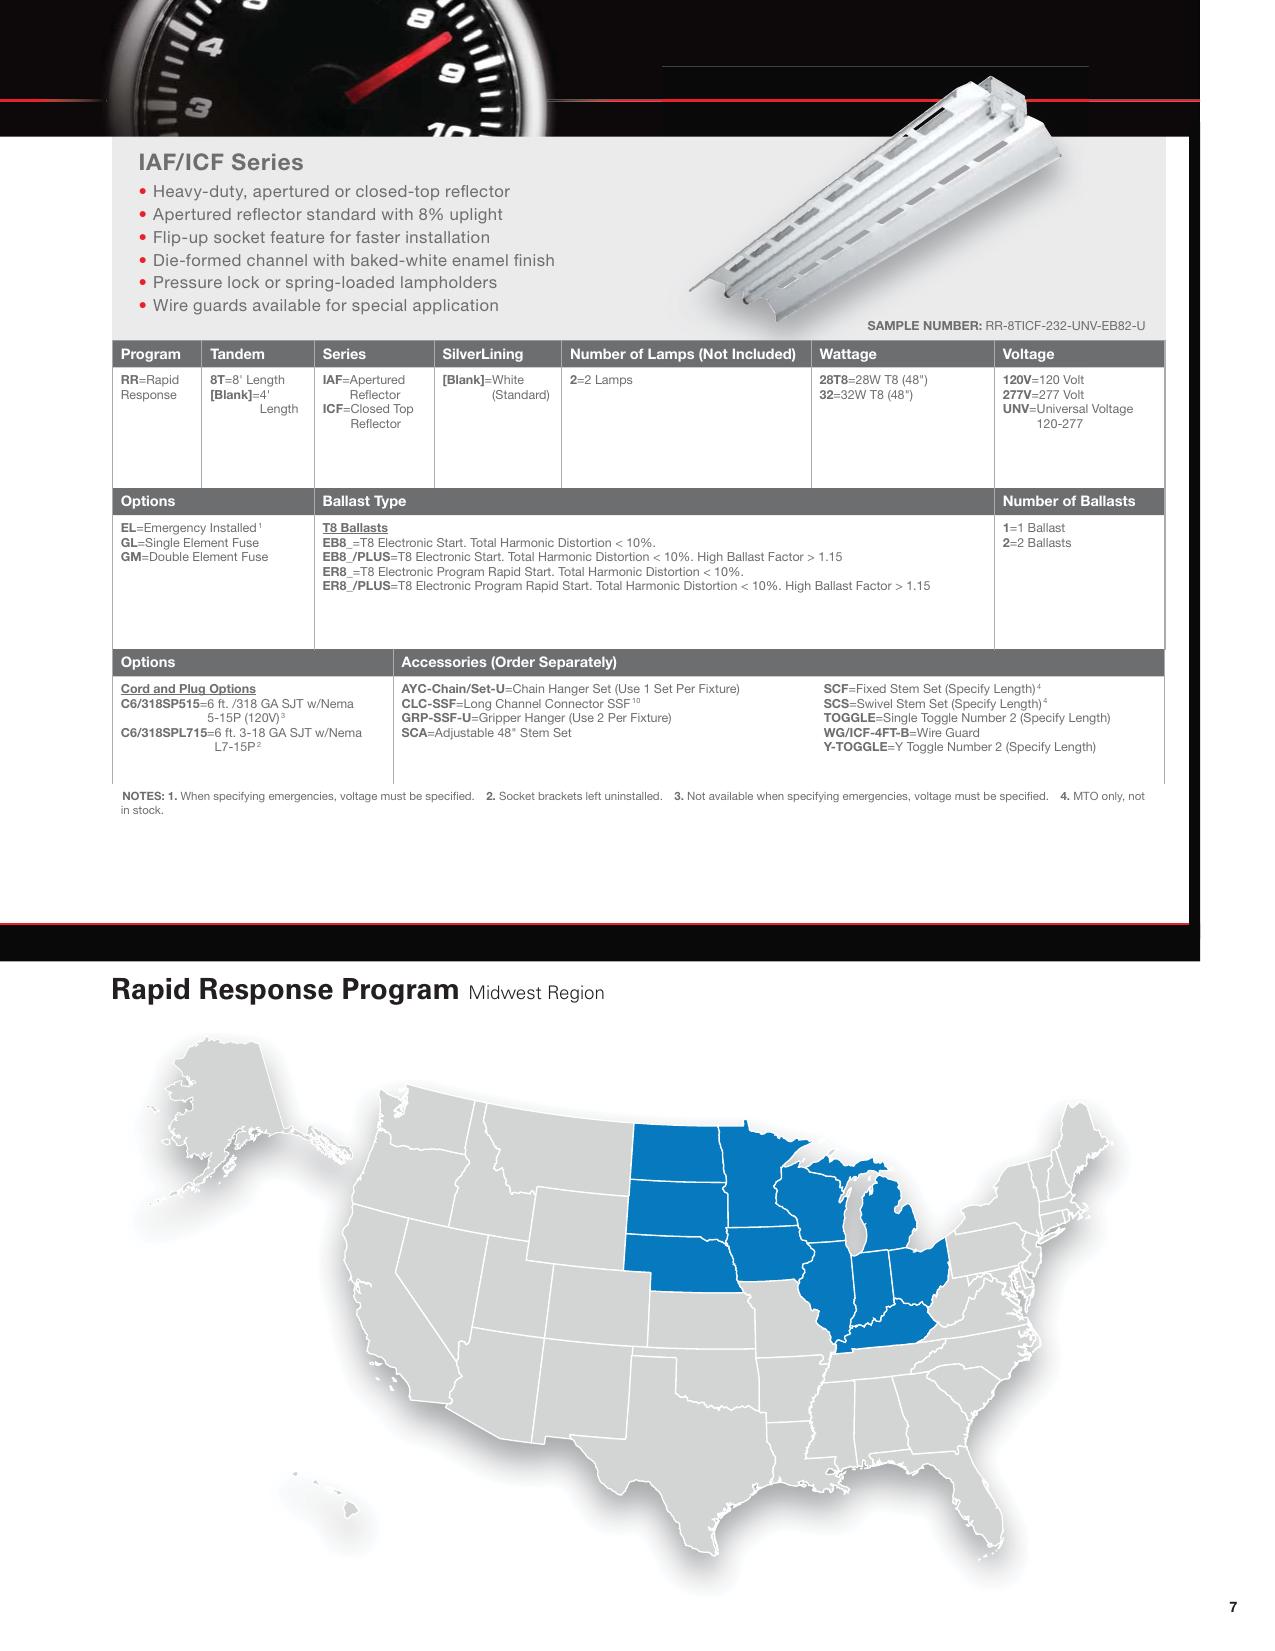 Rapid Response Program Midwest Region Brochure on